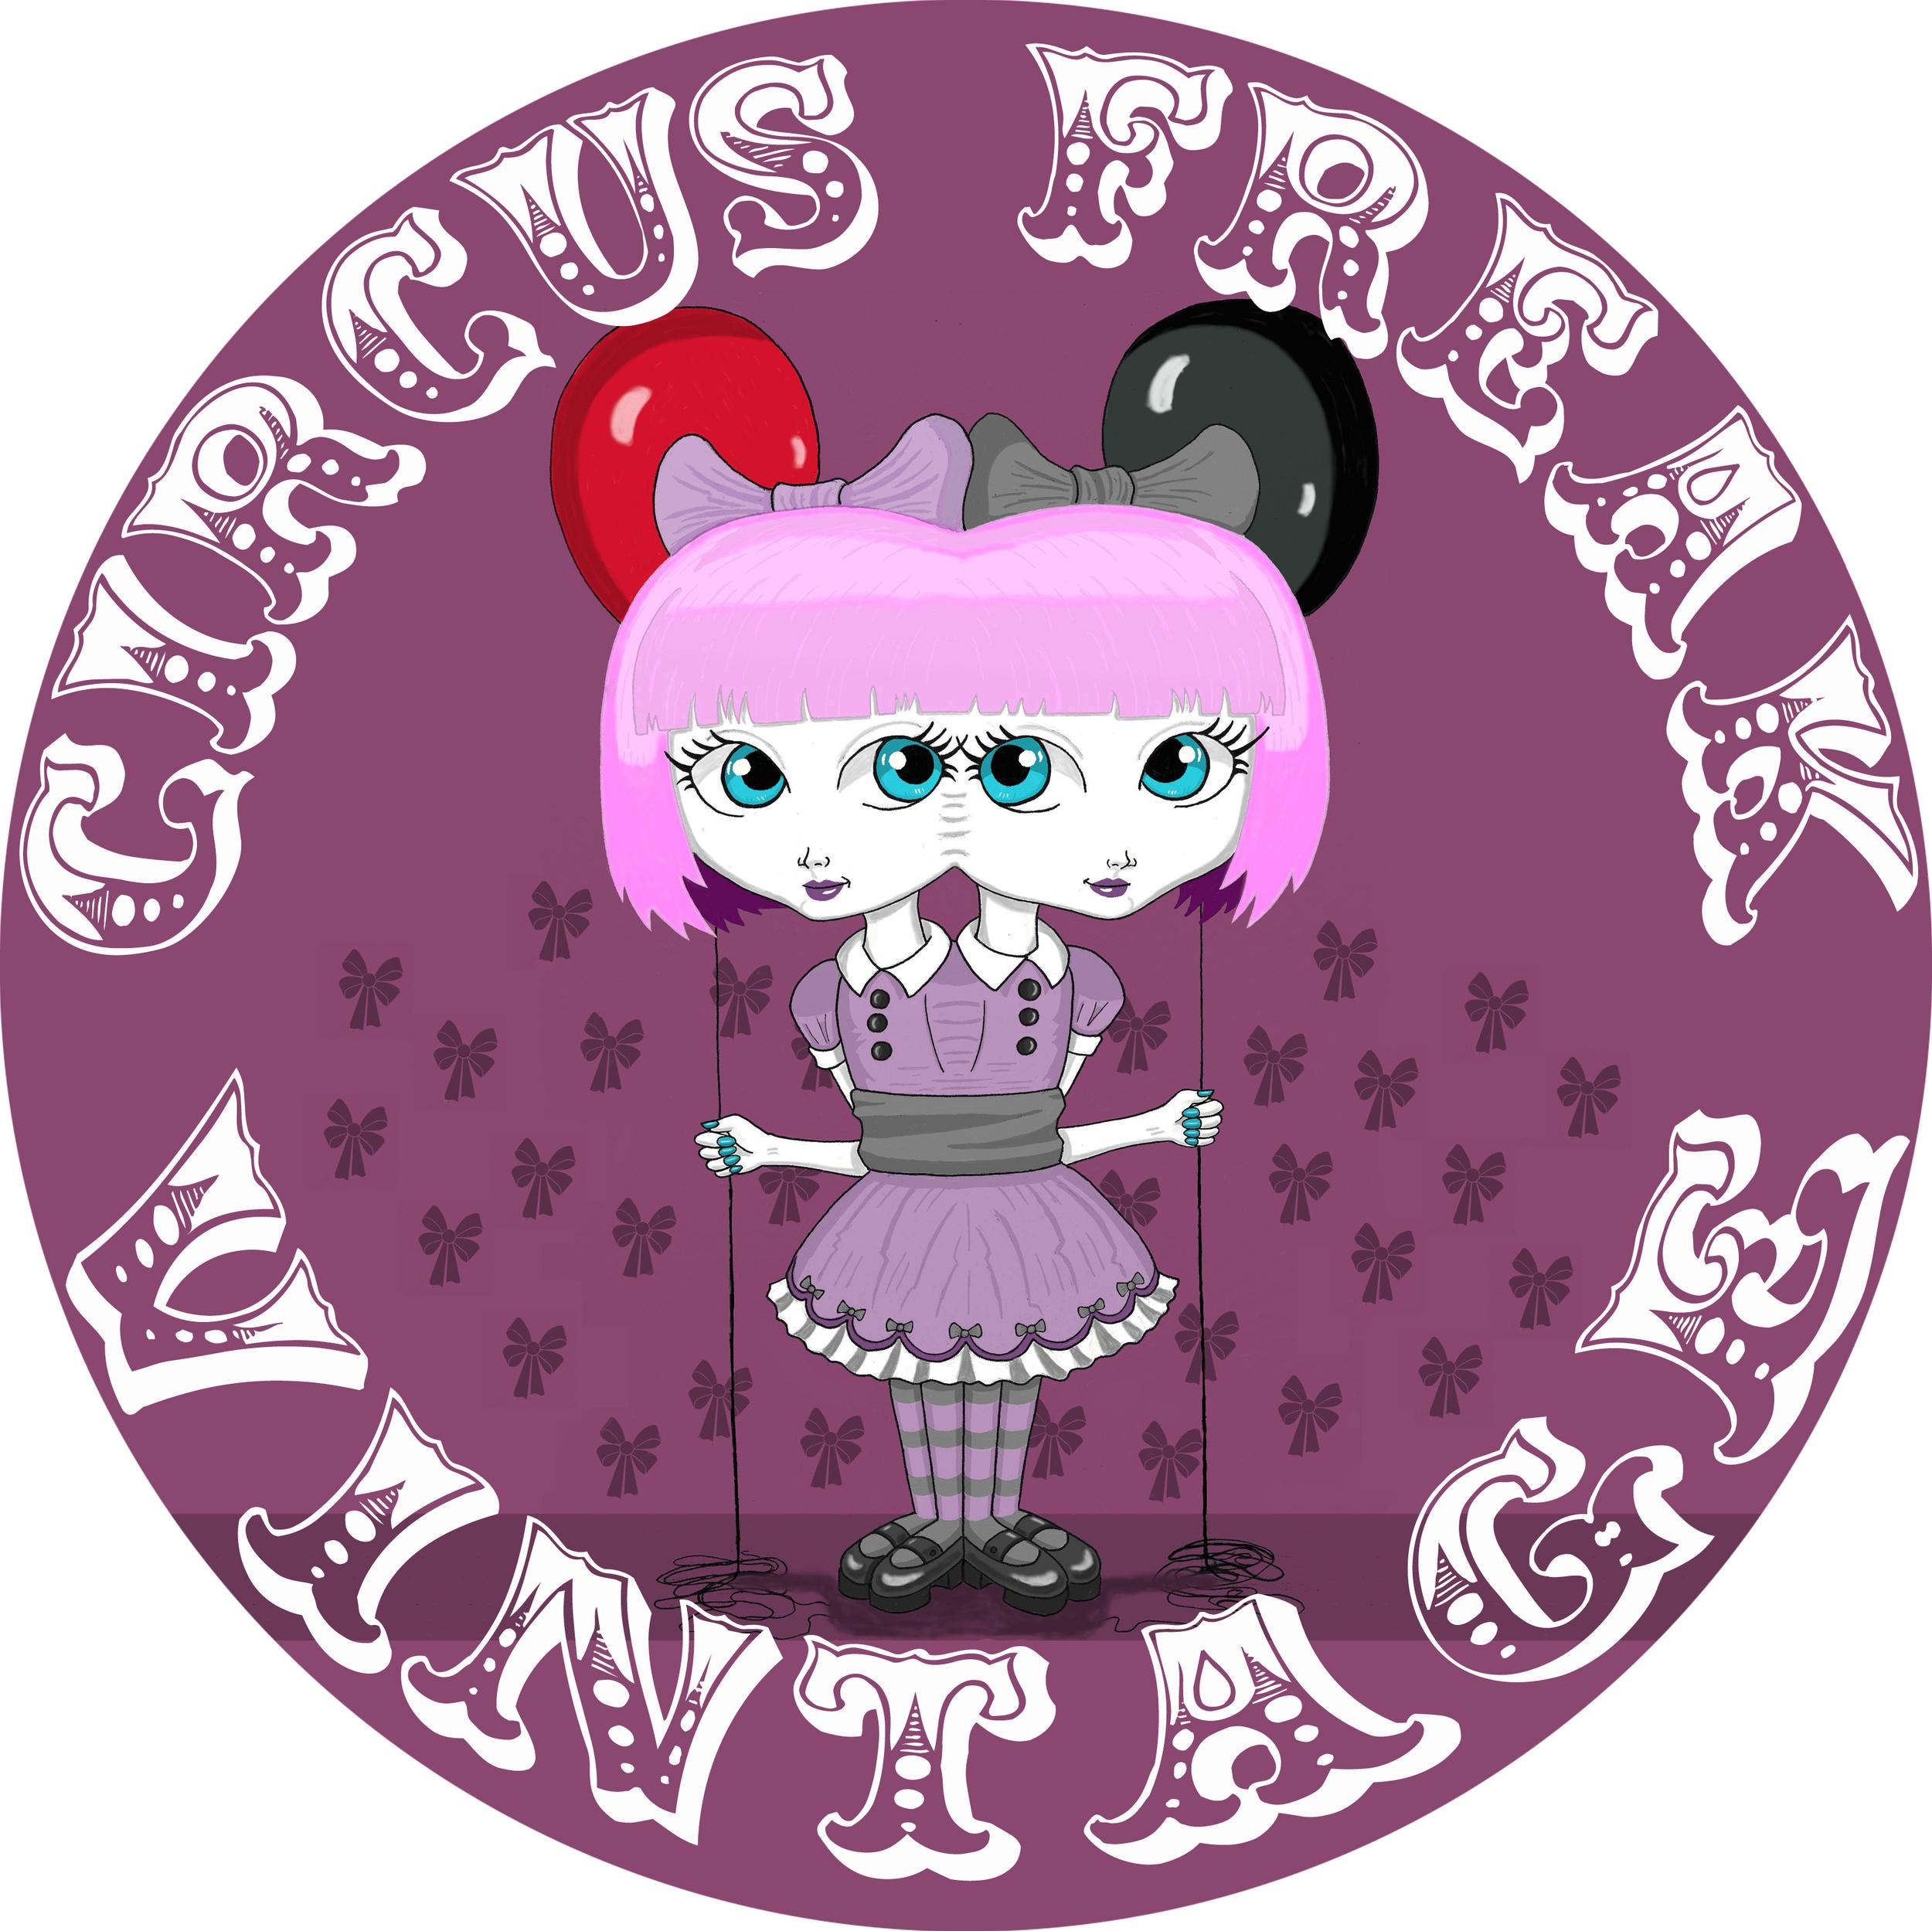 CIRCUS FREAK VINTAGE